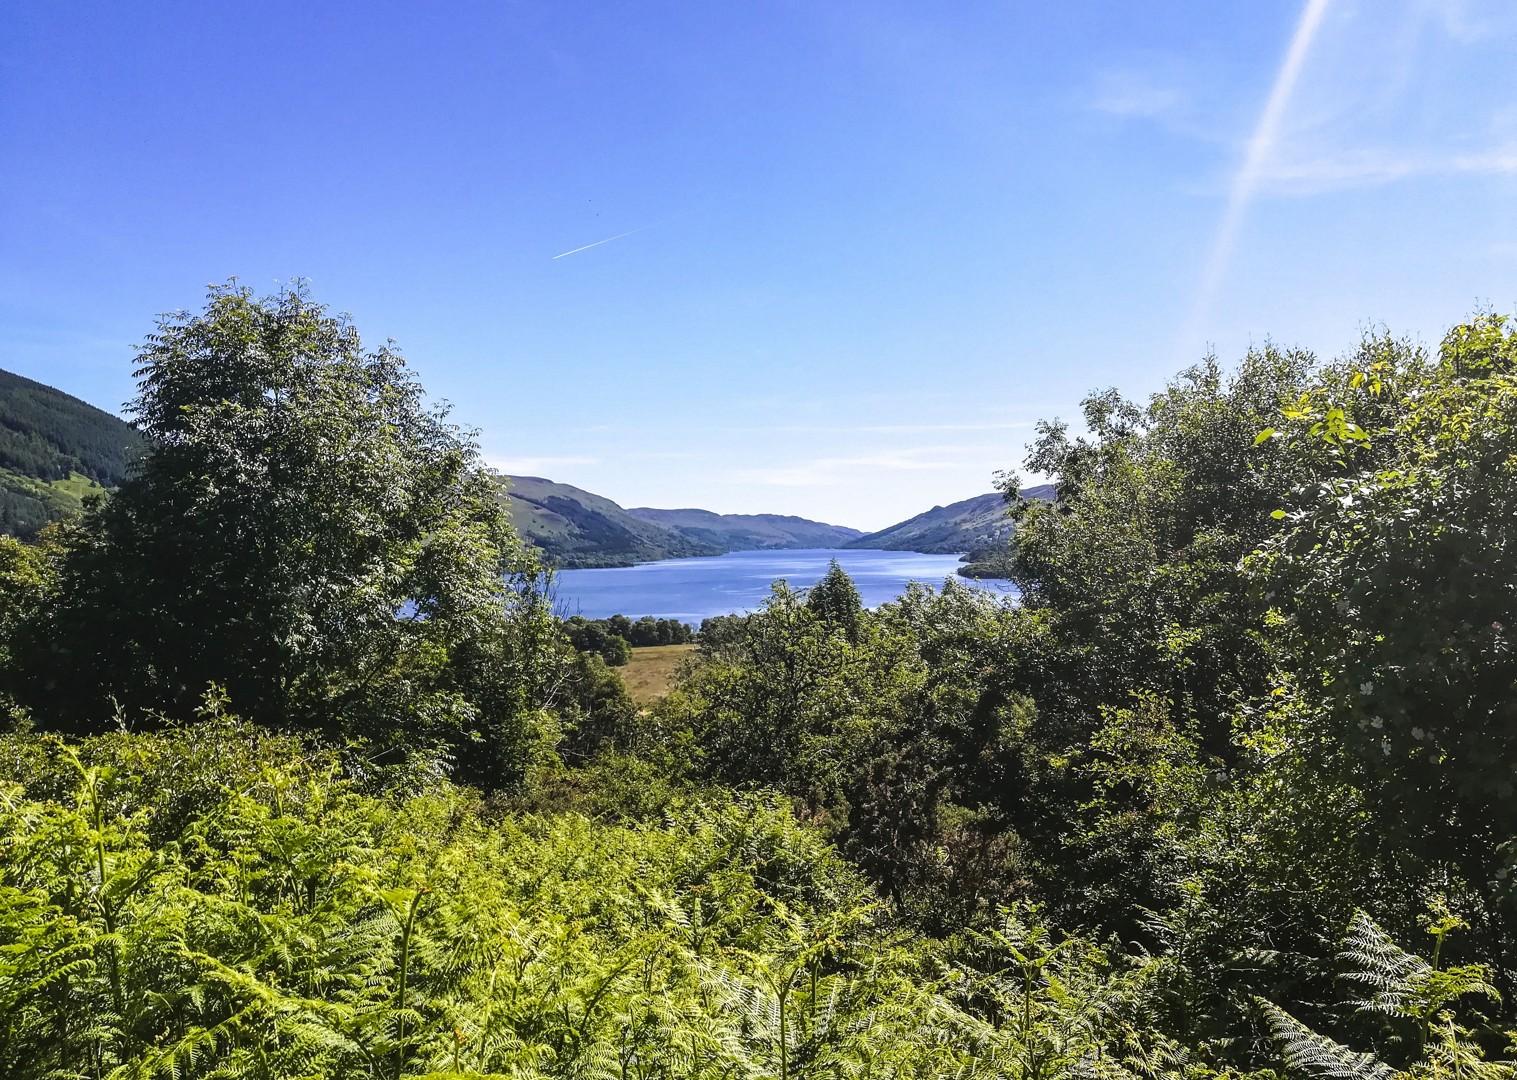 trossachs-scotland-uk-mountains-glens-lochs-fun-cycling-holiday.jpg - NEW! UK - Scotland - Lochs and Glens - Guided Leisure Cycling Holiday - Leisure Cycling